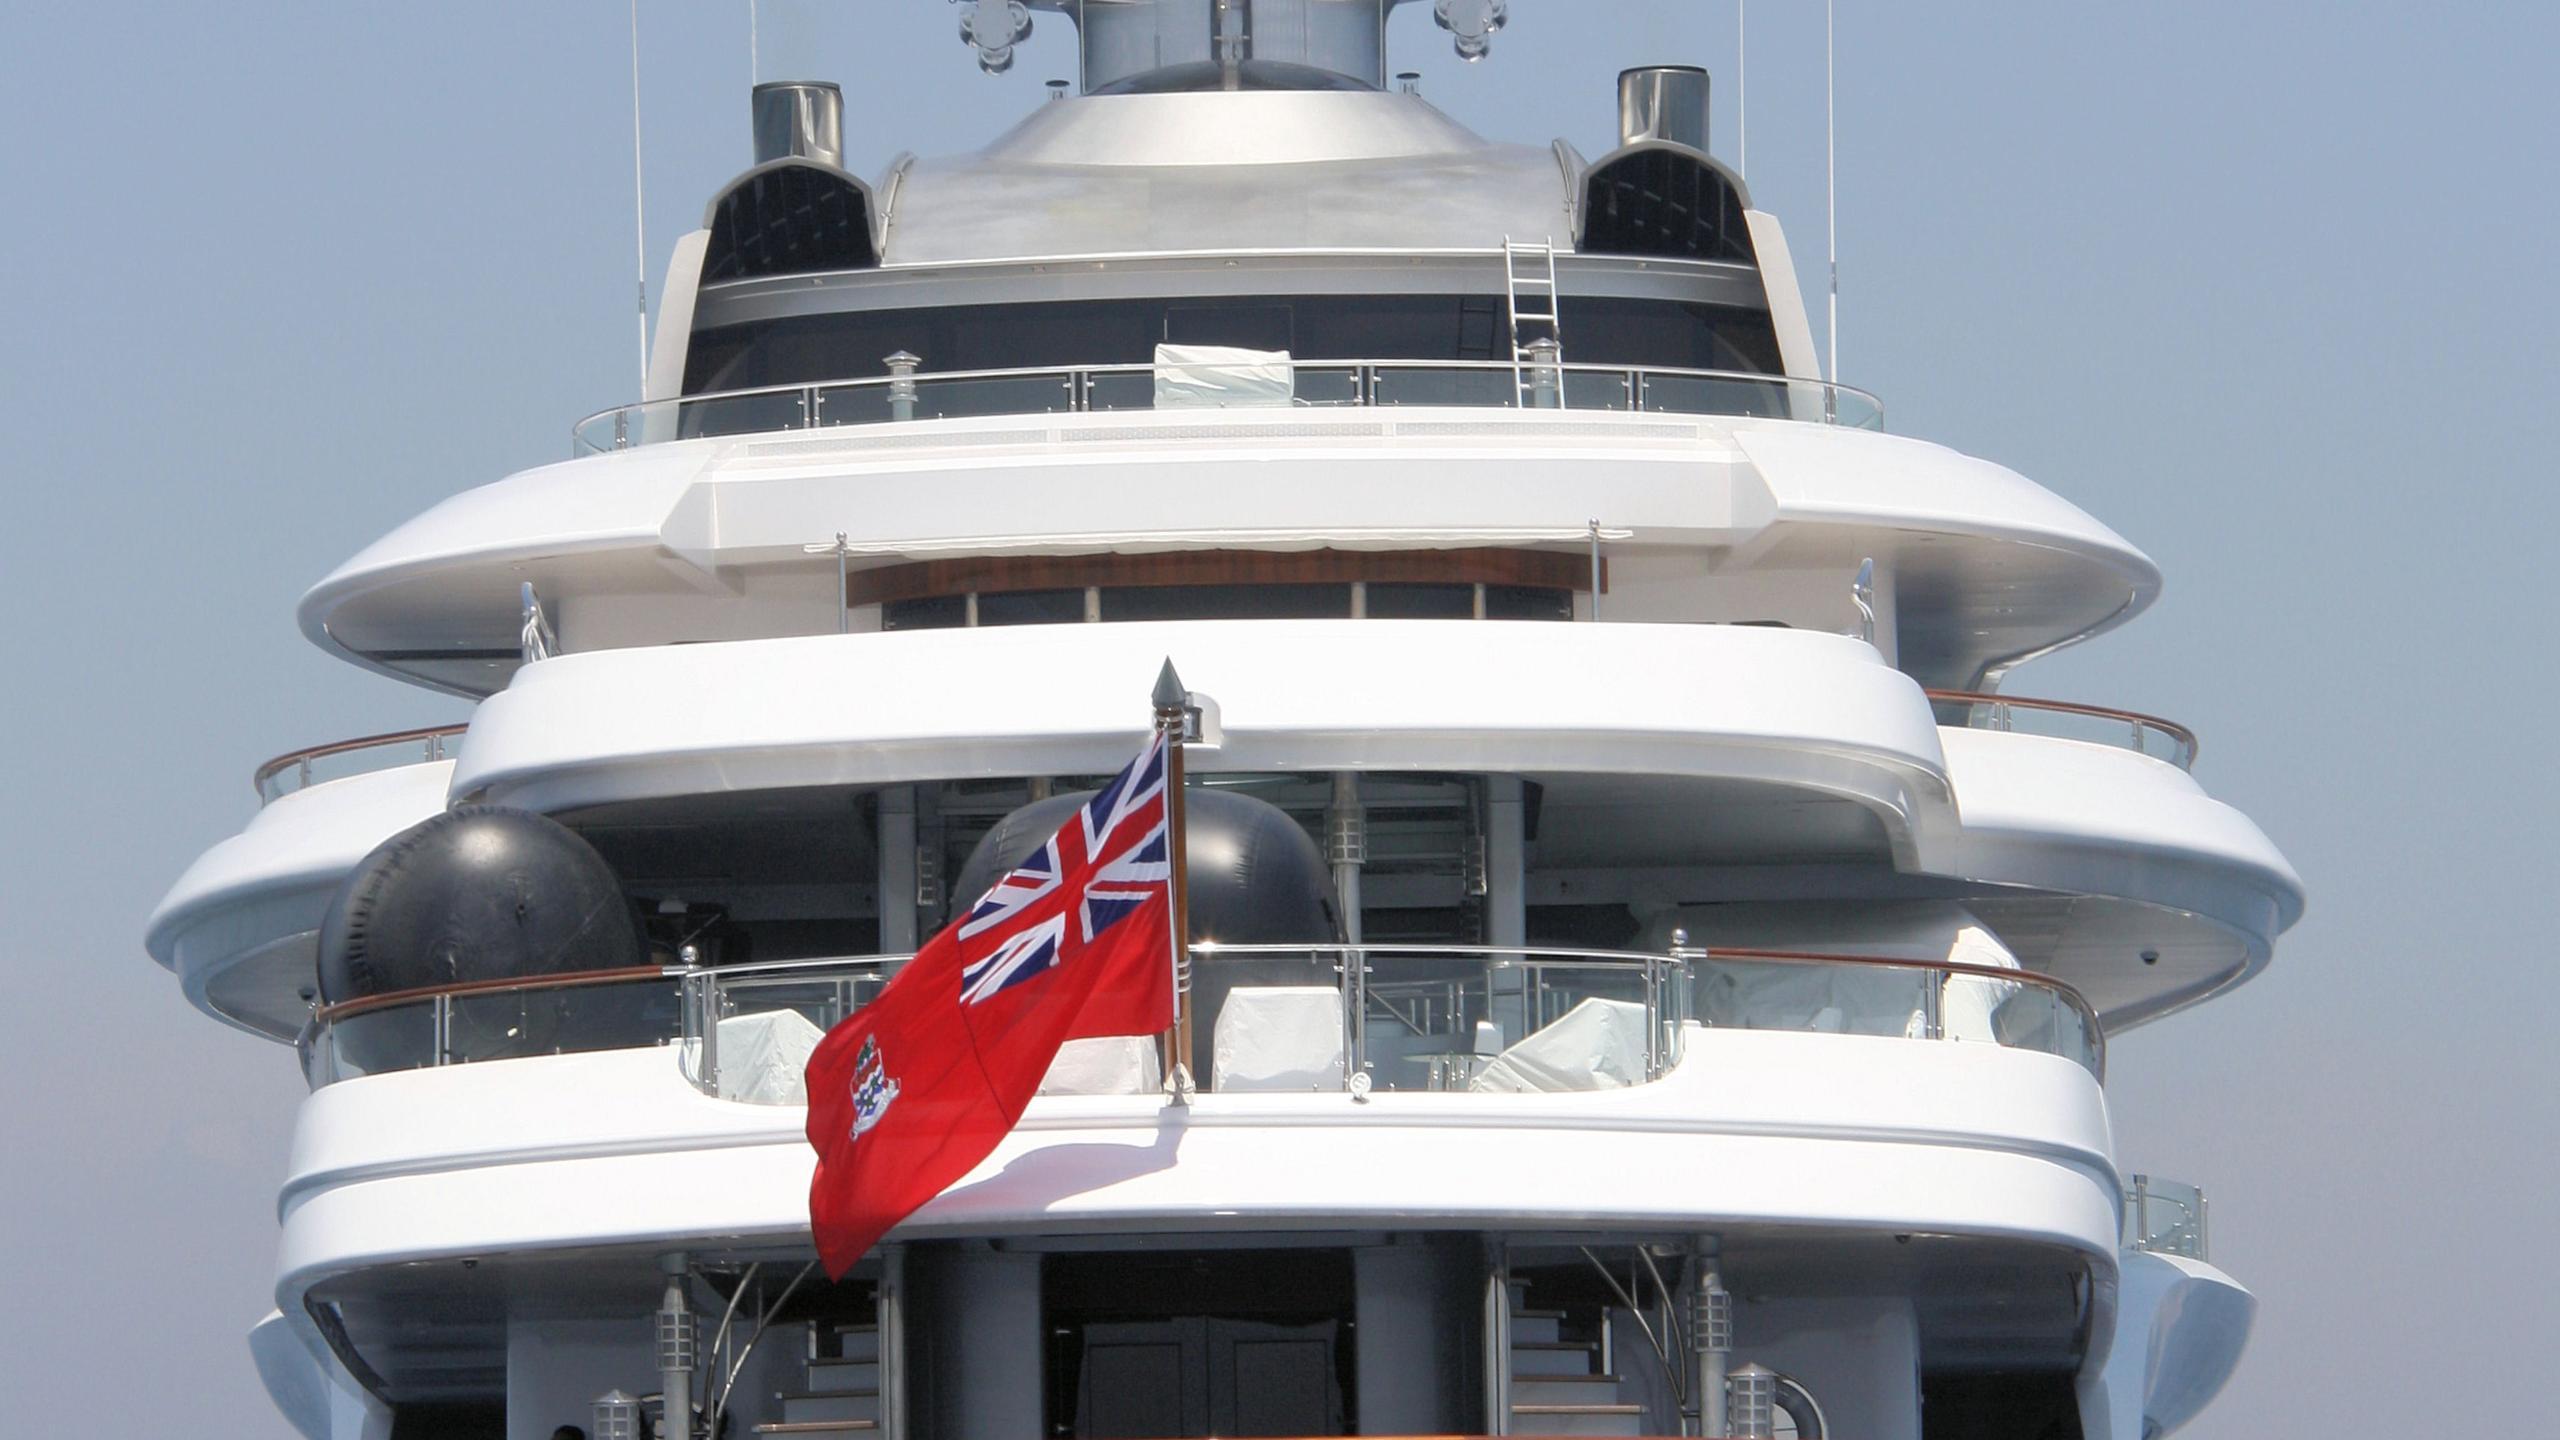 Attessa-IV-motor-yacht-hayashikane-1999-101m-stern